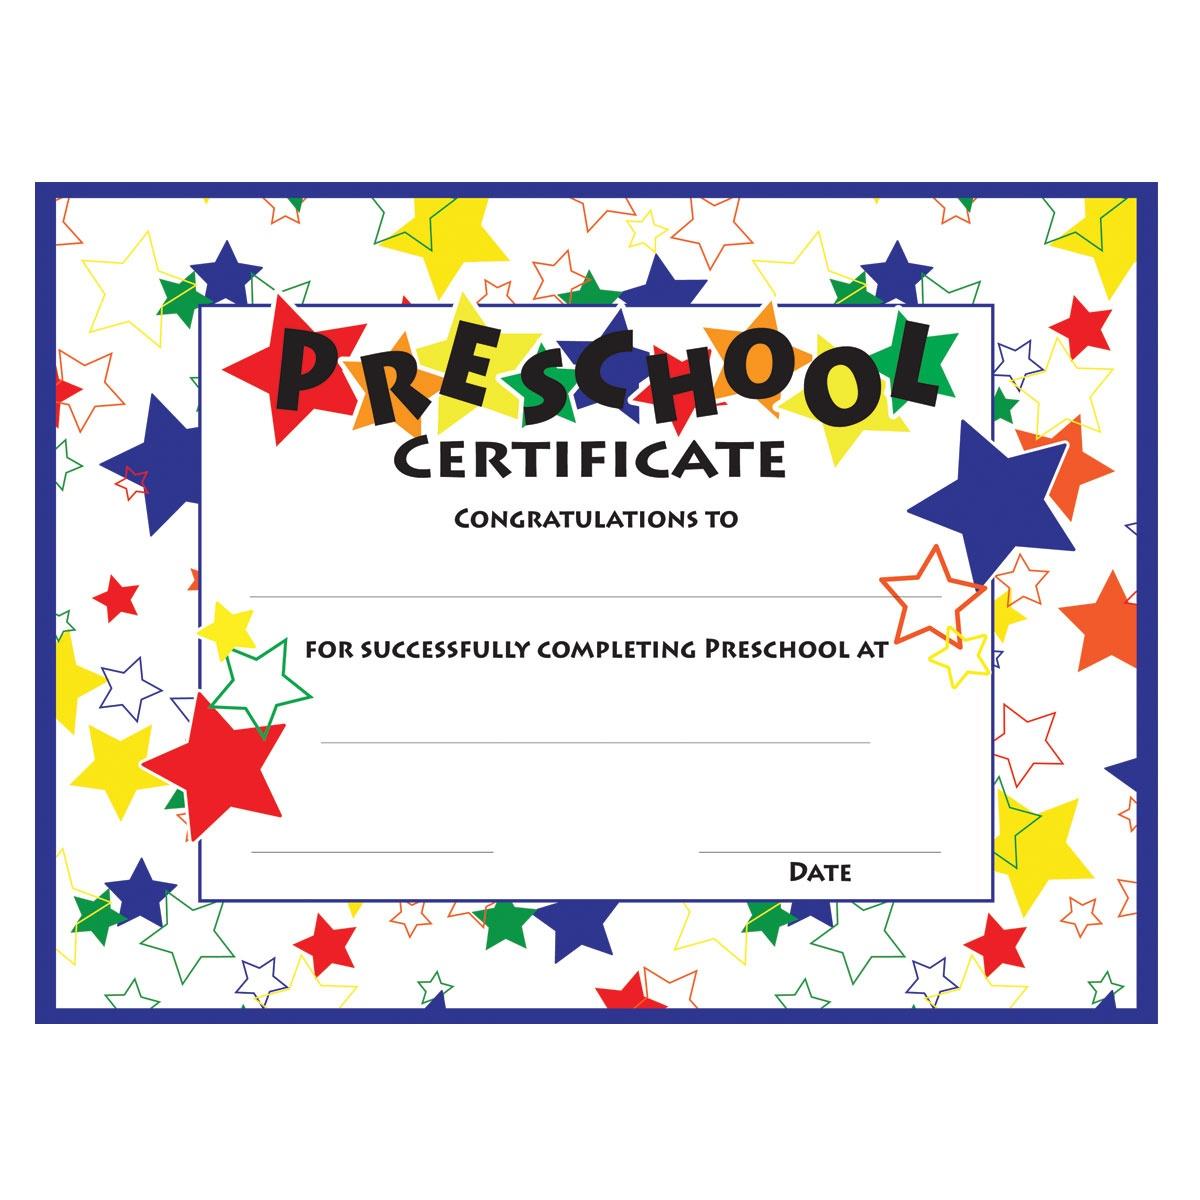 11+ Preschool Certificate Templates - Pdf | Free & Premium Templates - Free Printable Children's Certificates Templates